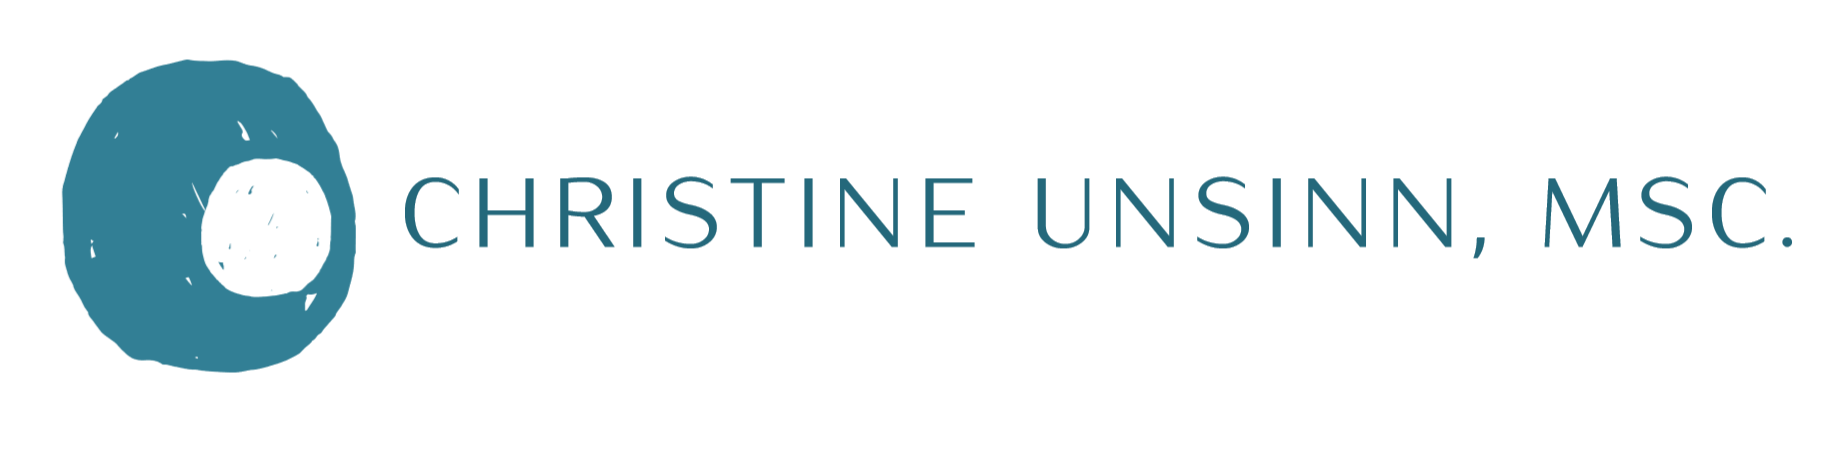 Christine Unsinn, MSc.